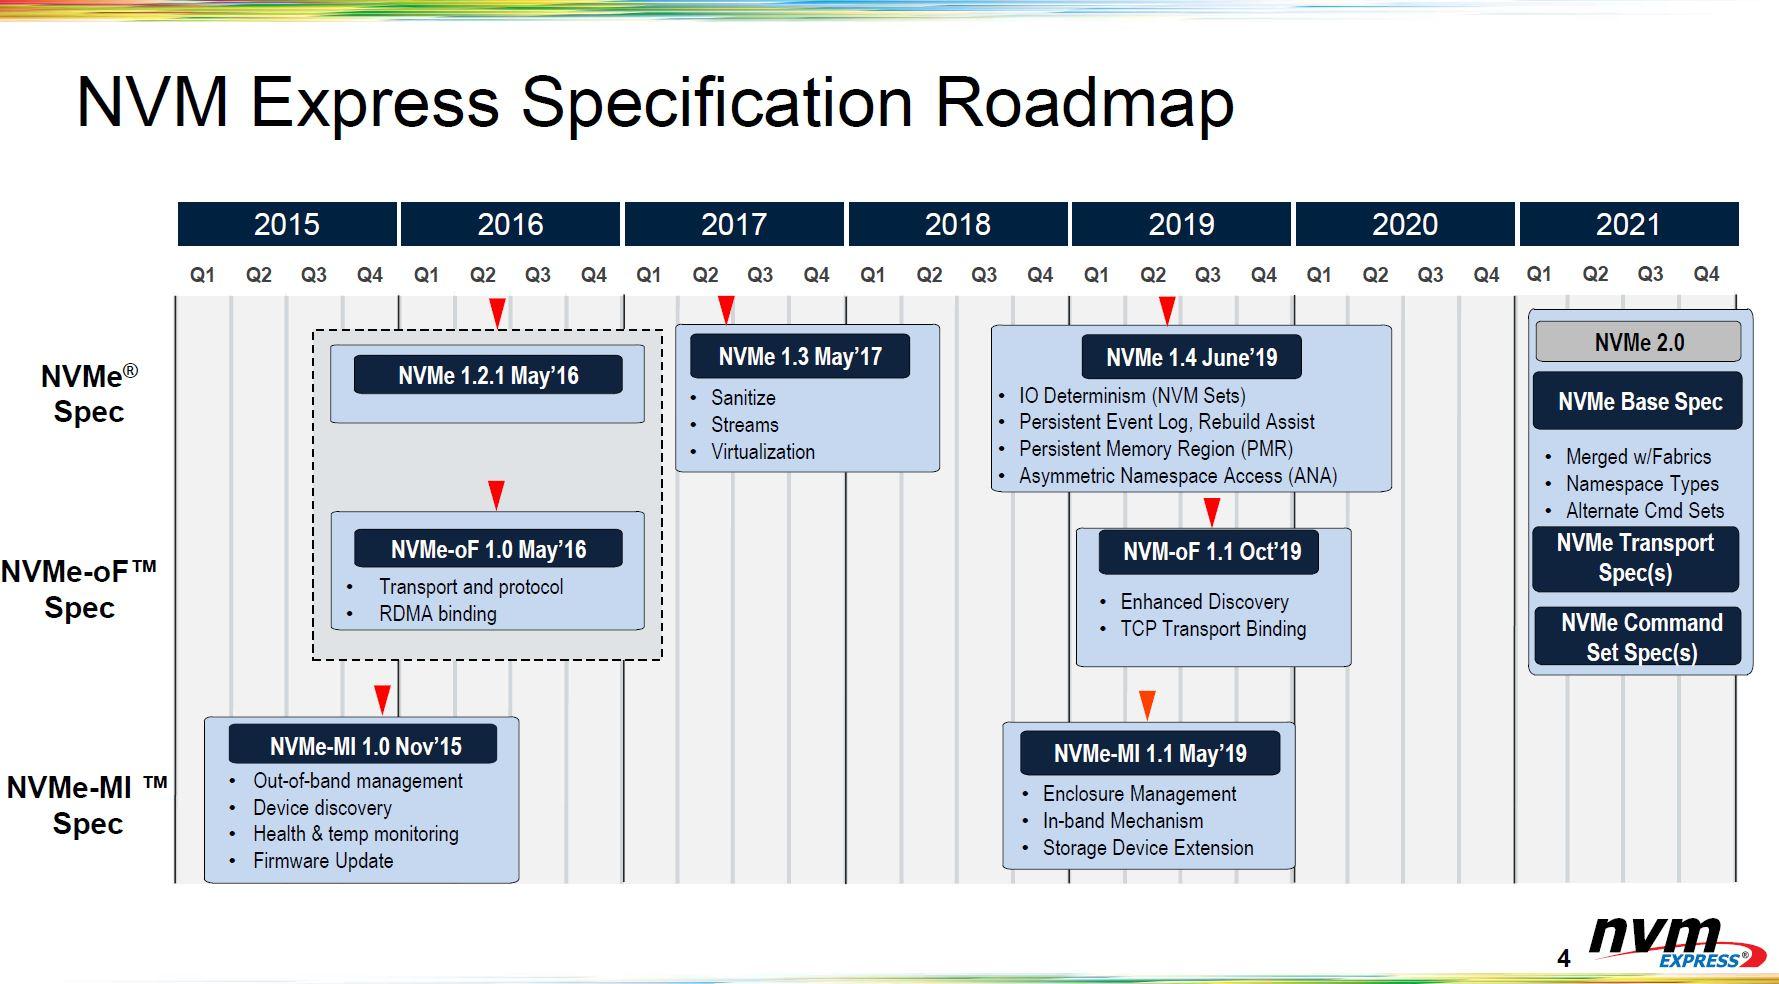 NVMe Spec Roadmap Q2 2021